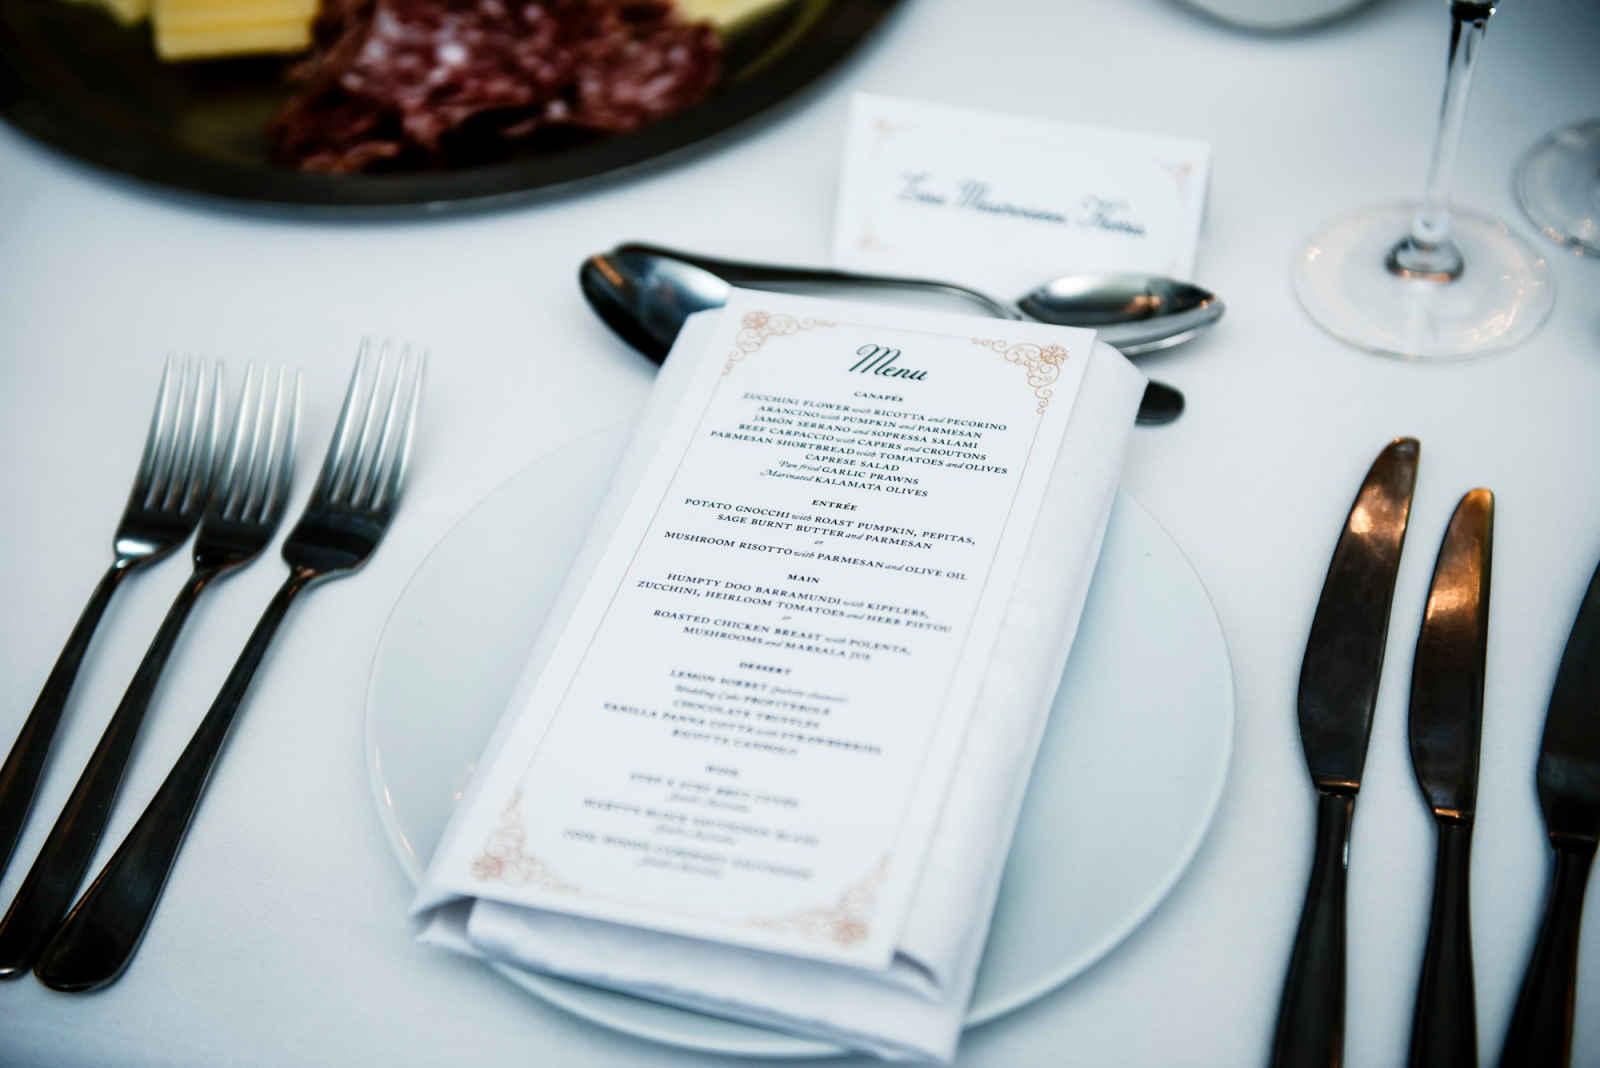 the menu at sergeants mess